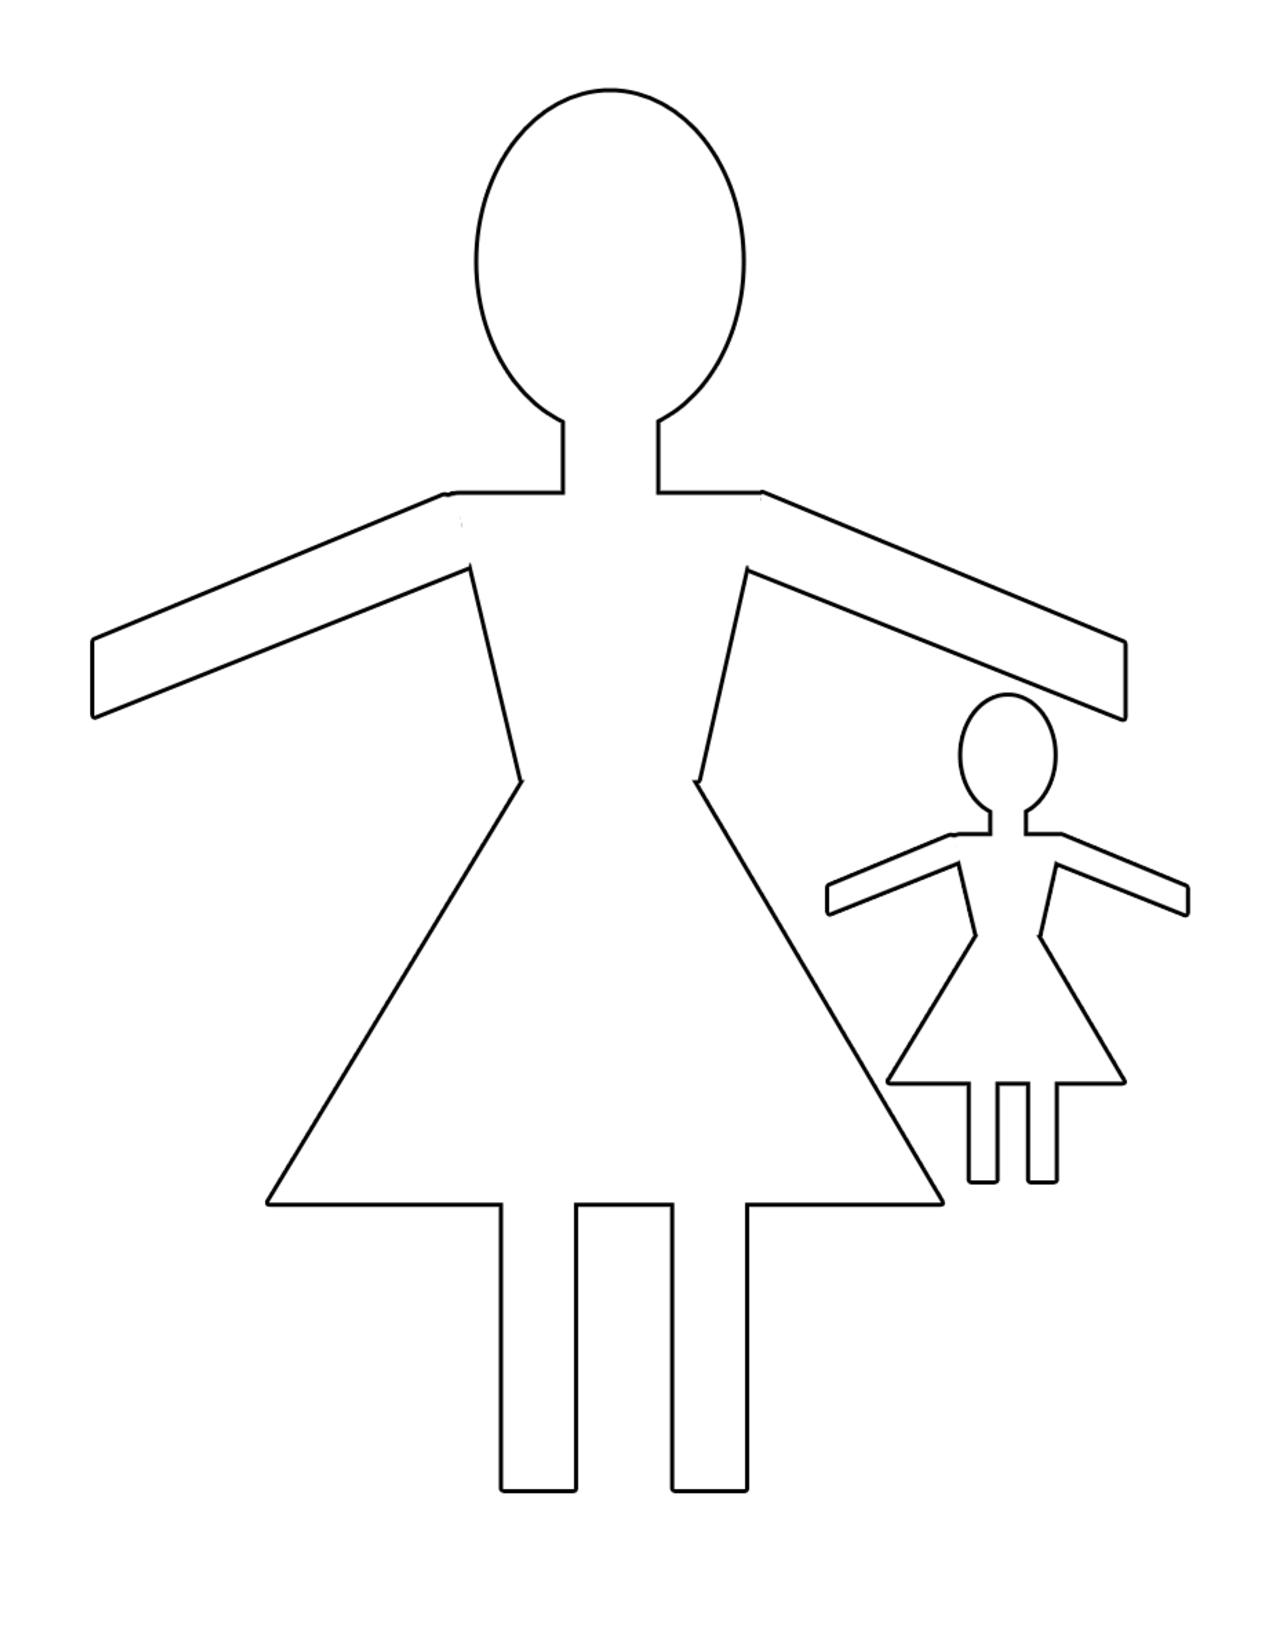 Fashion paper dolls template